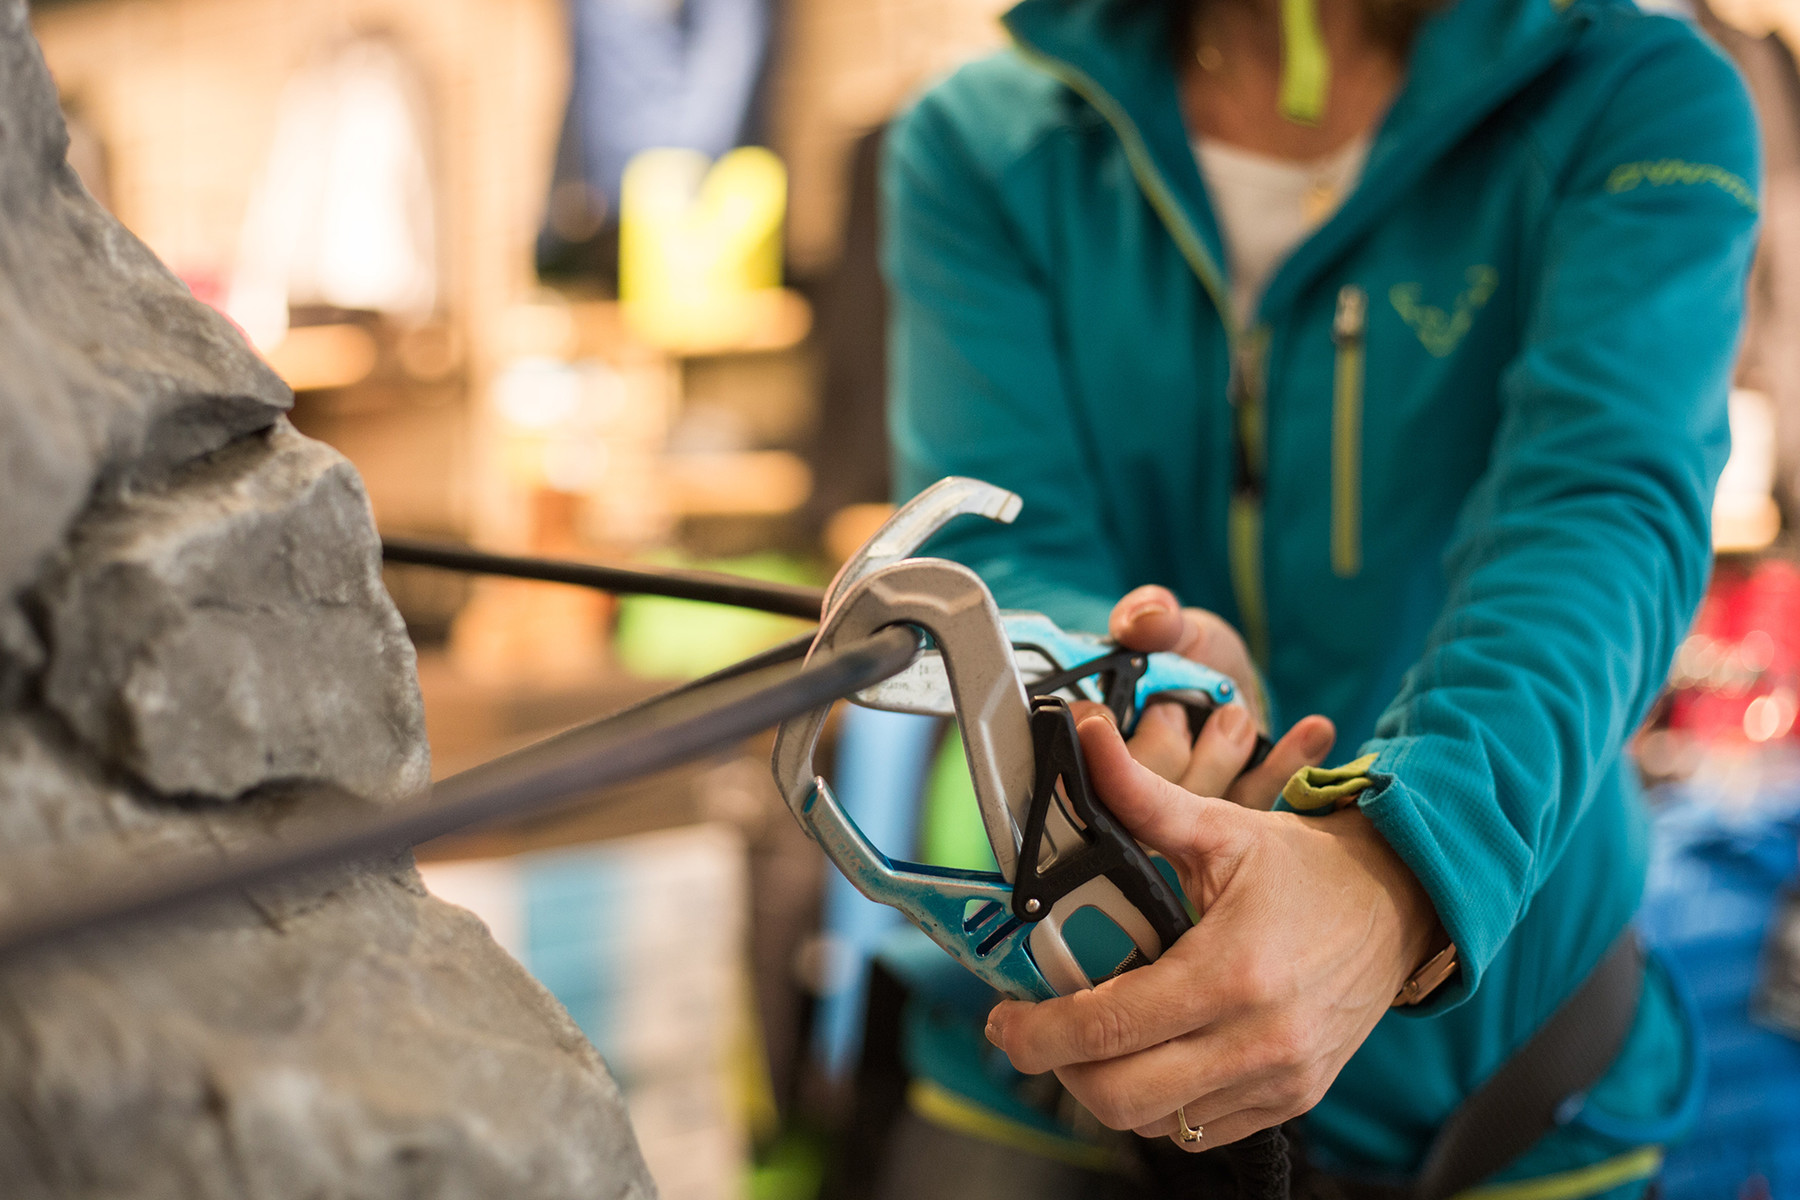 Klettersteigset Verleih Berchtesgaden : Klettersteigausrüstungs & kletterset verleih berchtesgaden